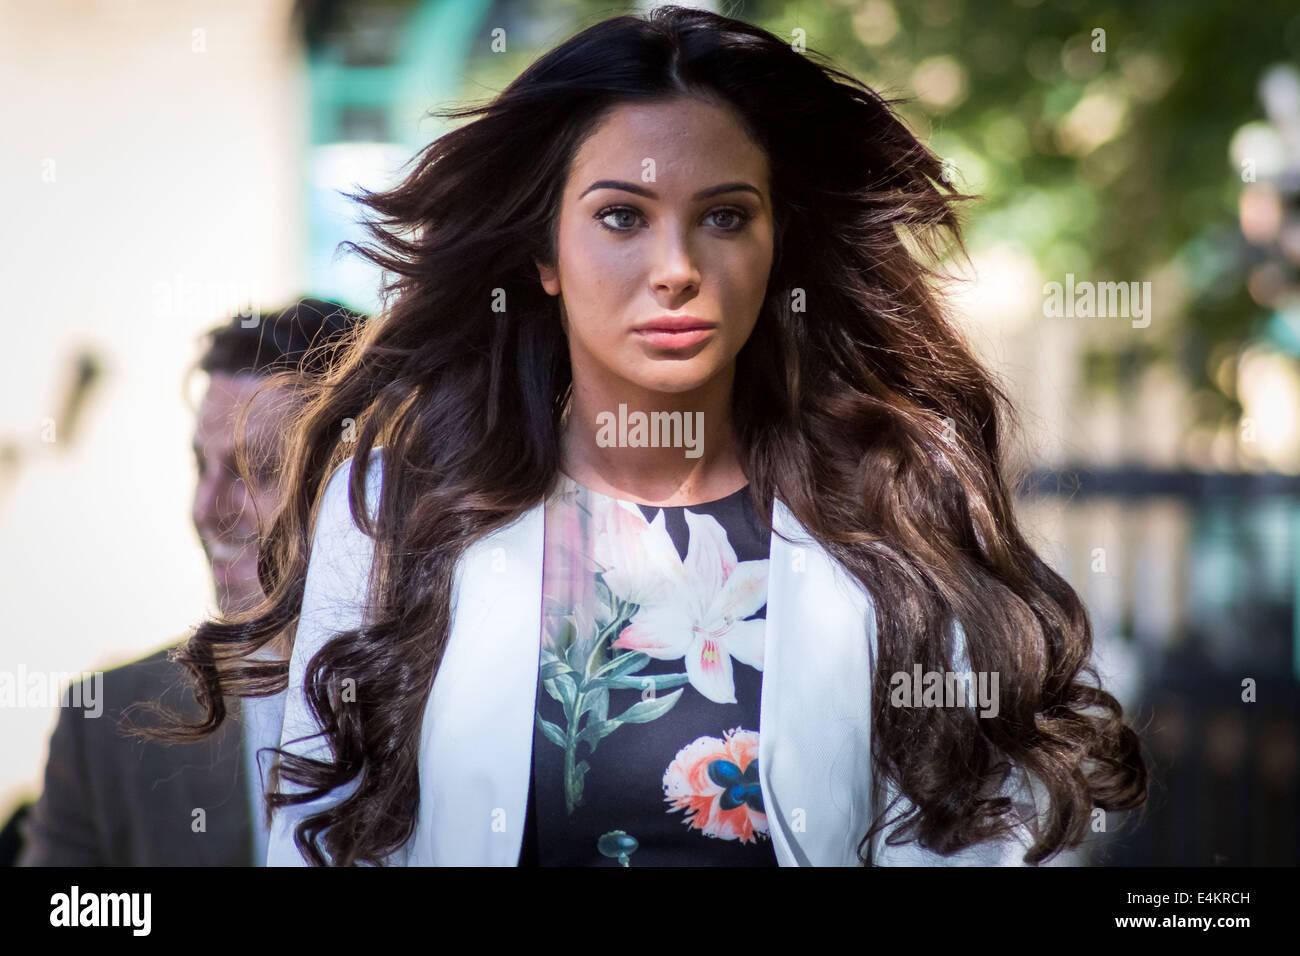 London, UK. 14th July, 2014. Tulisa Contostavlos arrives at Southwark Crown Court in London Credit:  Guy Corbishley/Alamy - Stock Image